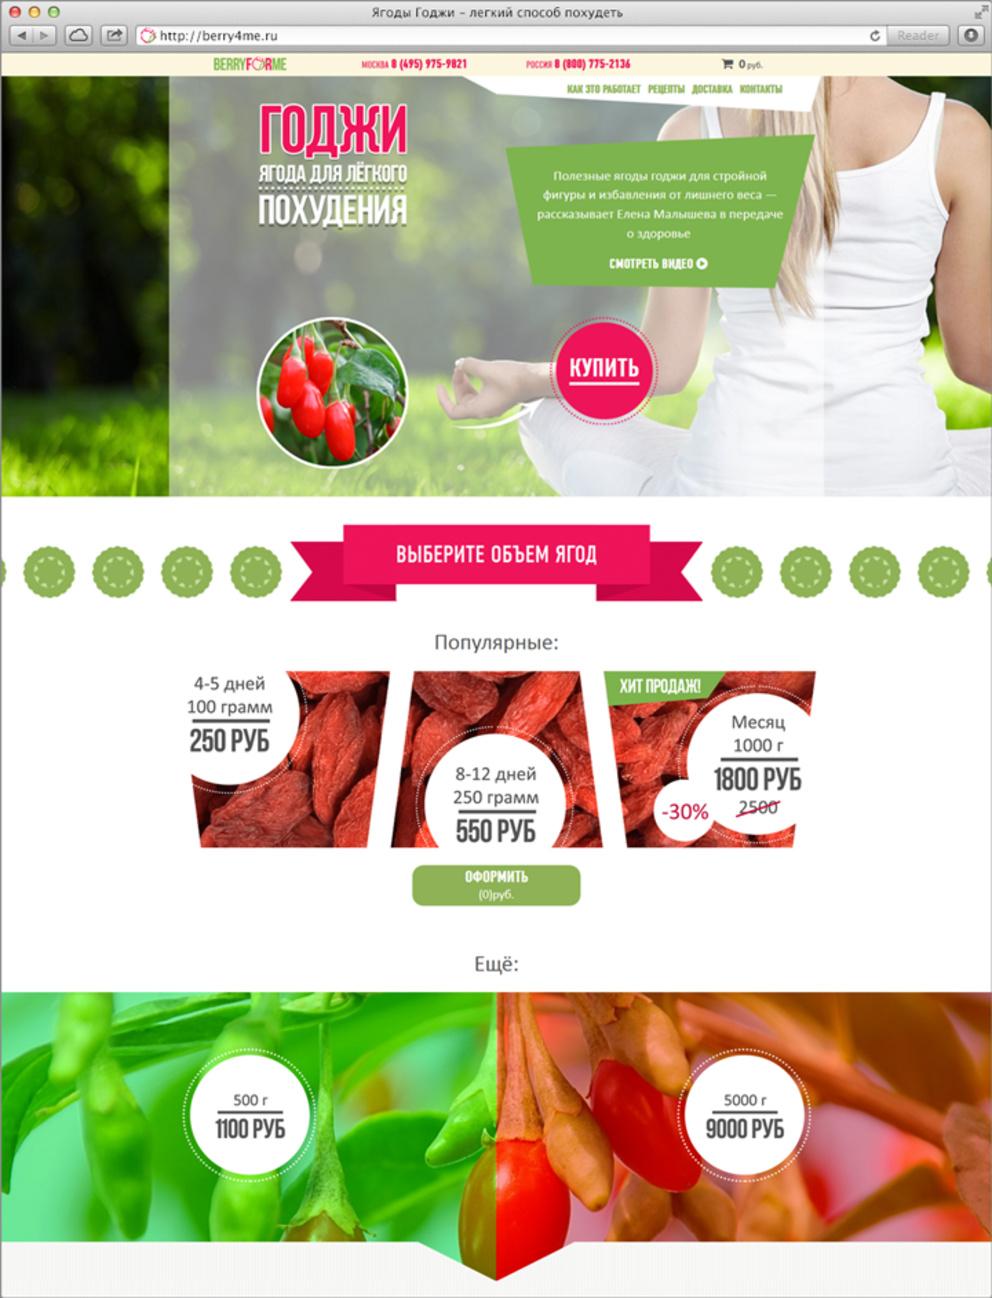 BerryForMe / Проект компании Концепт Логик